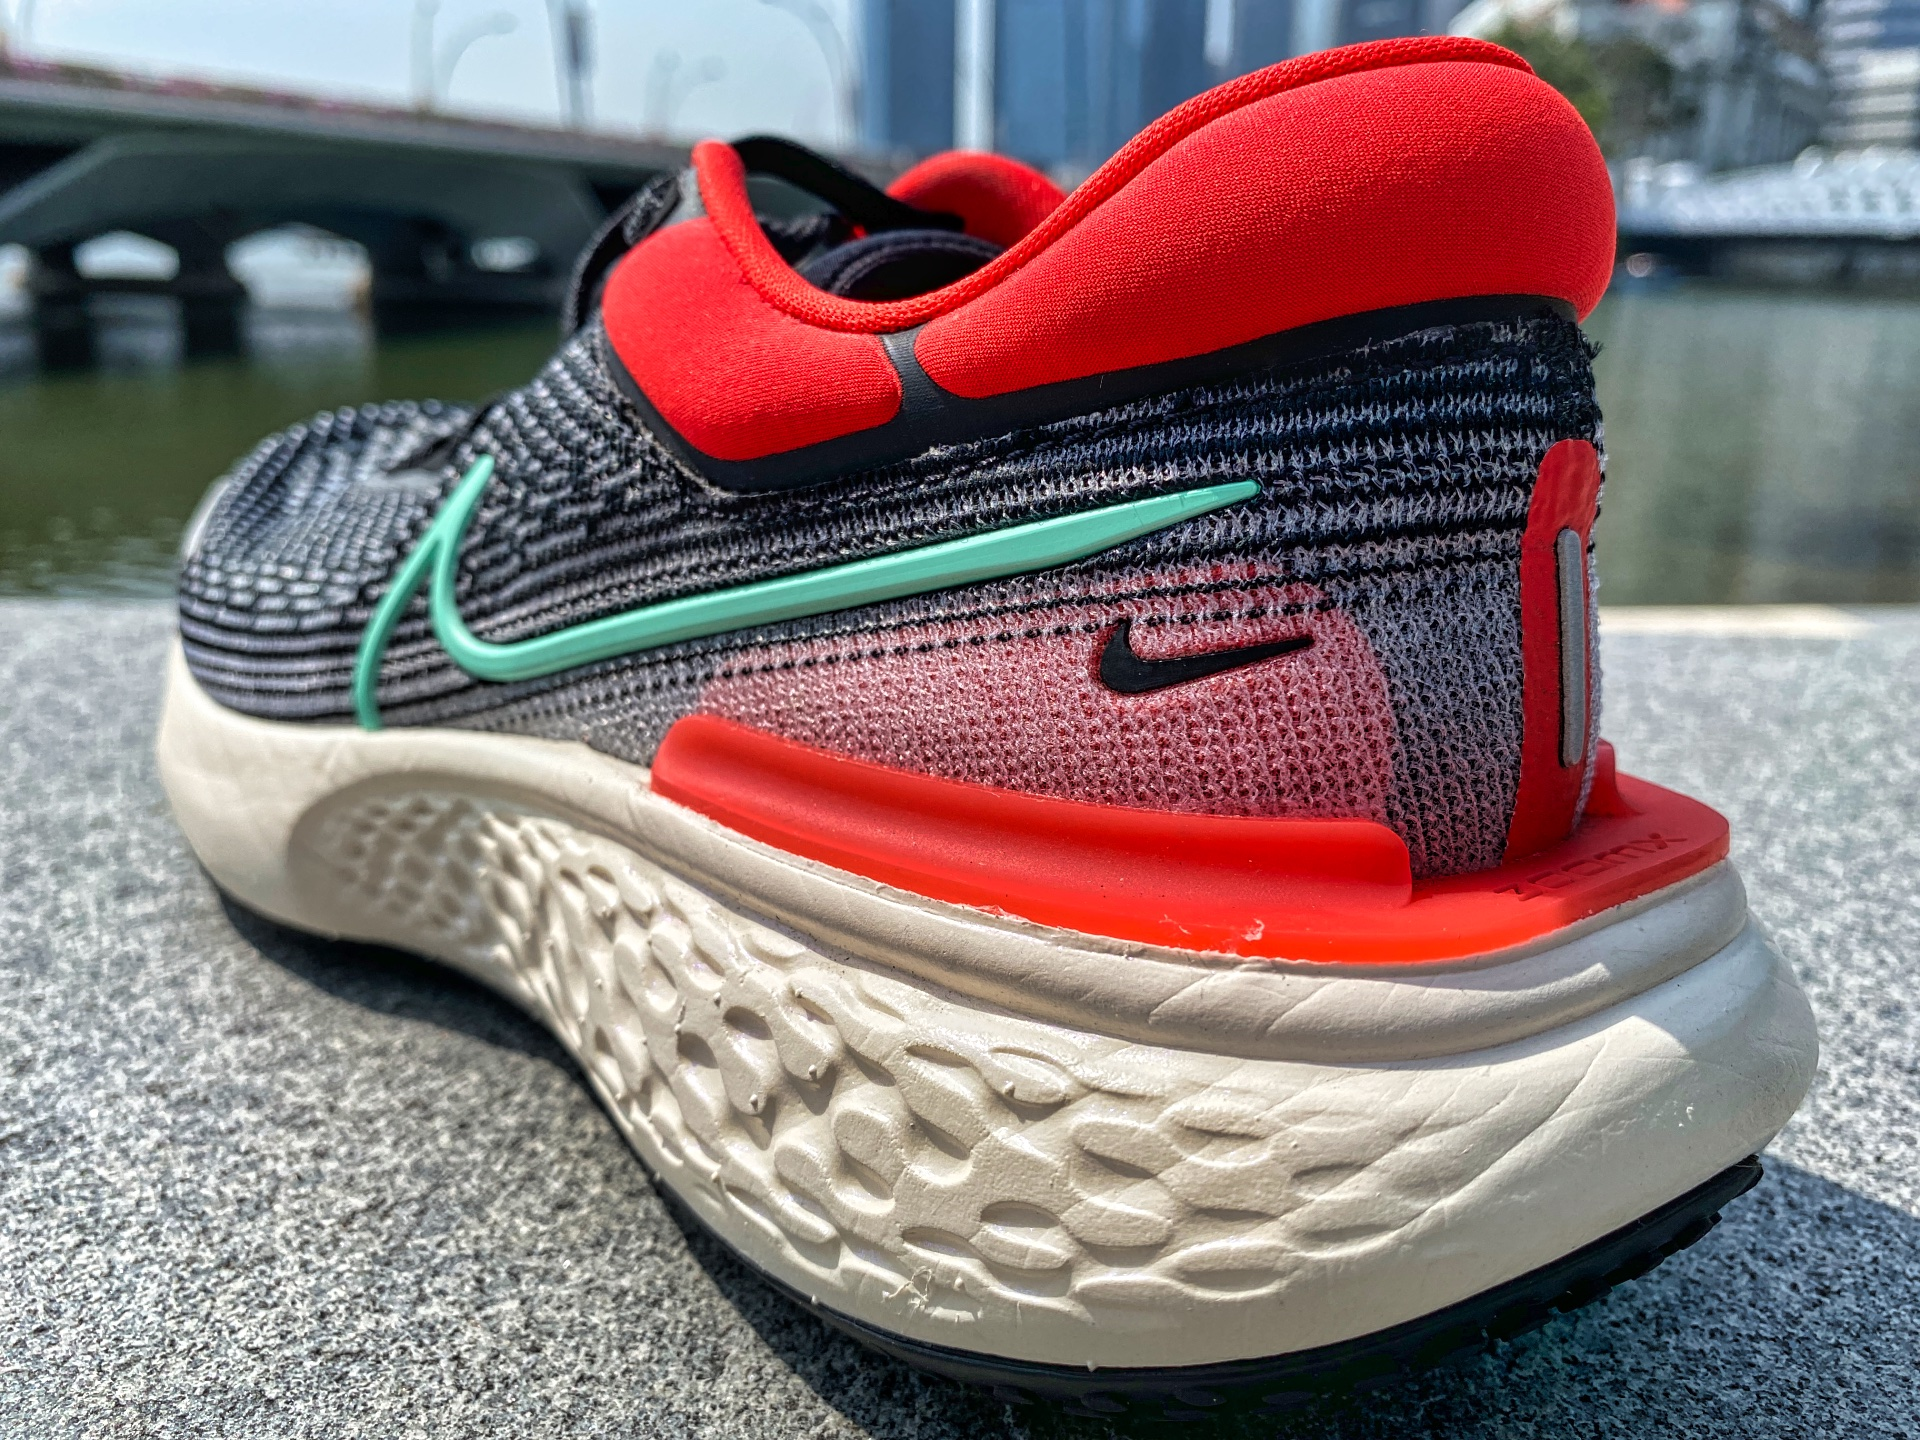 Nike ZoomX Invincible Run - pic 2407